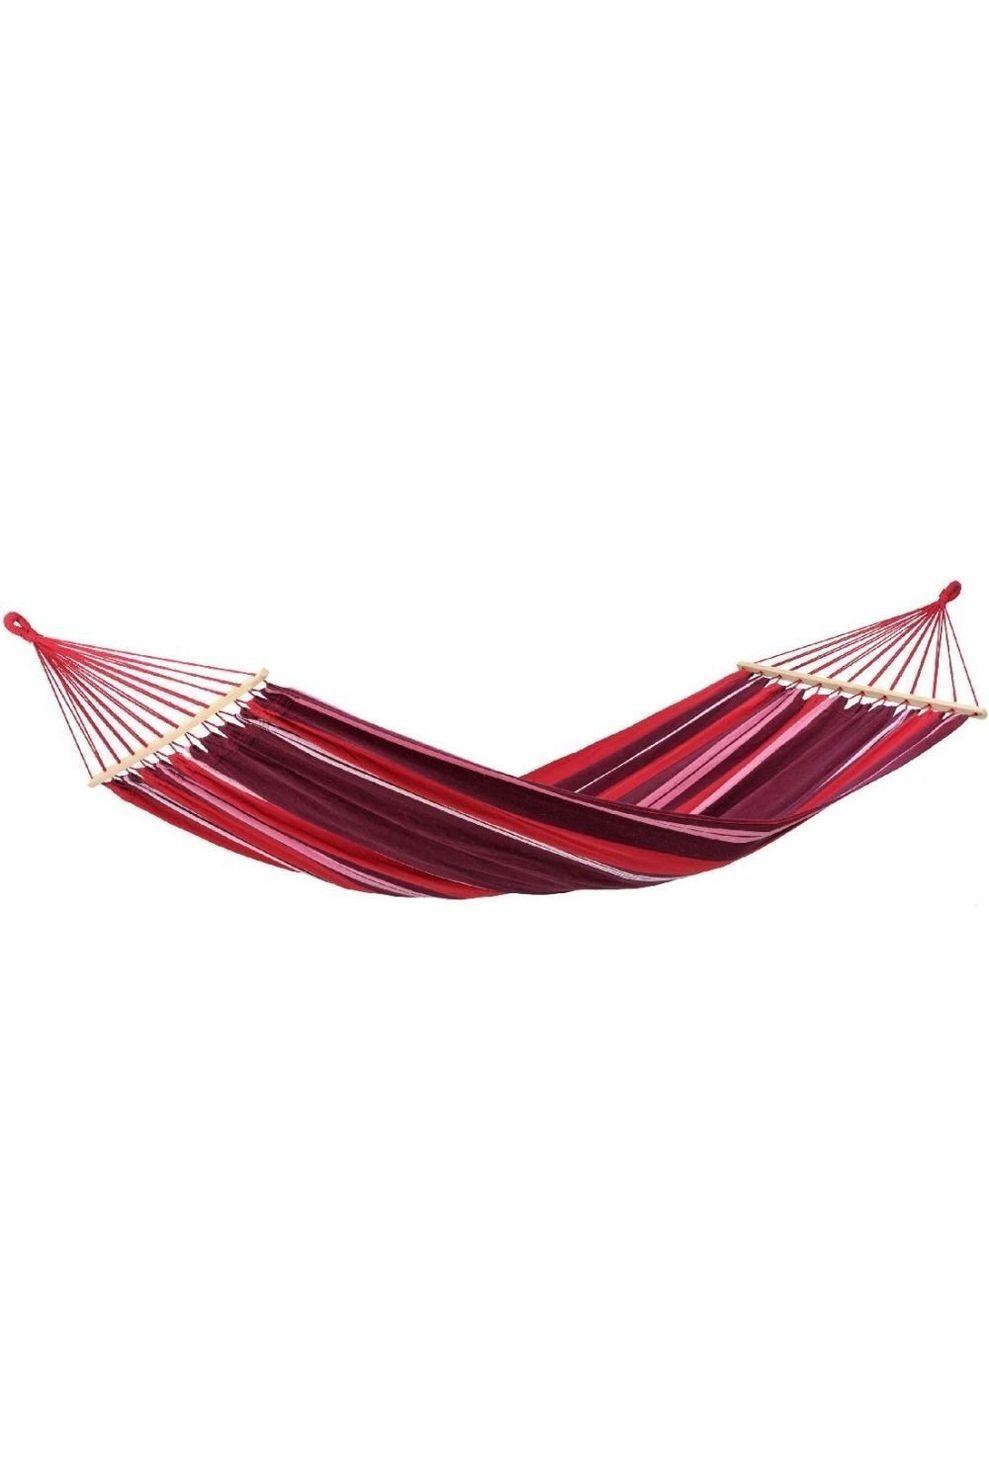 Amazonas Hangmat Samba - Rood/Roze